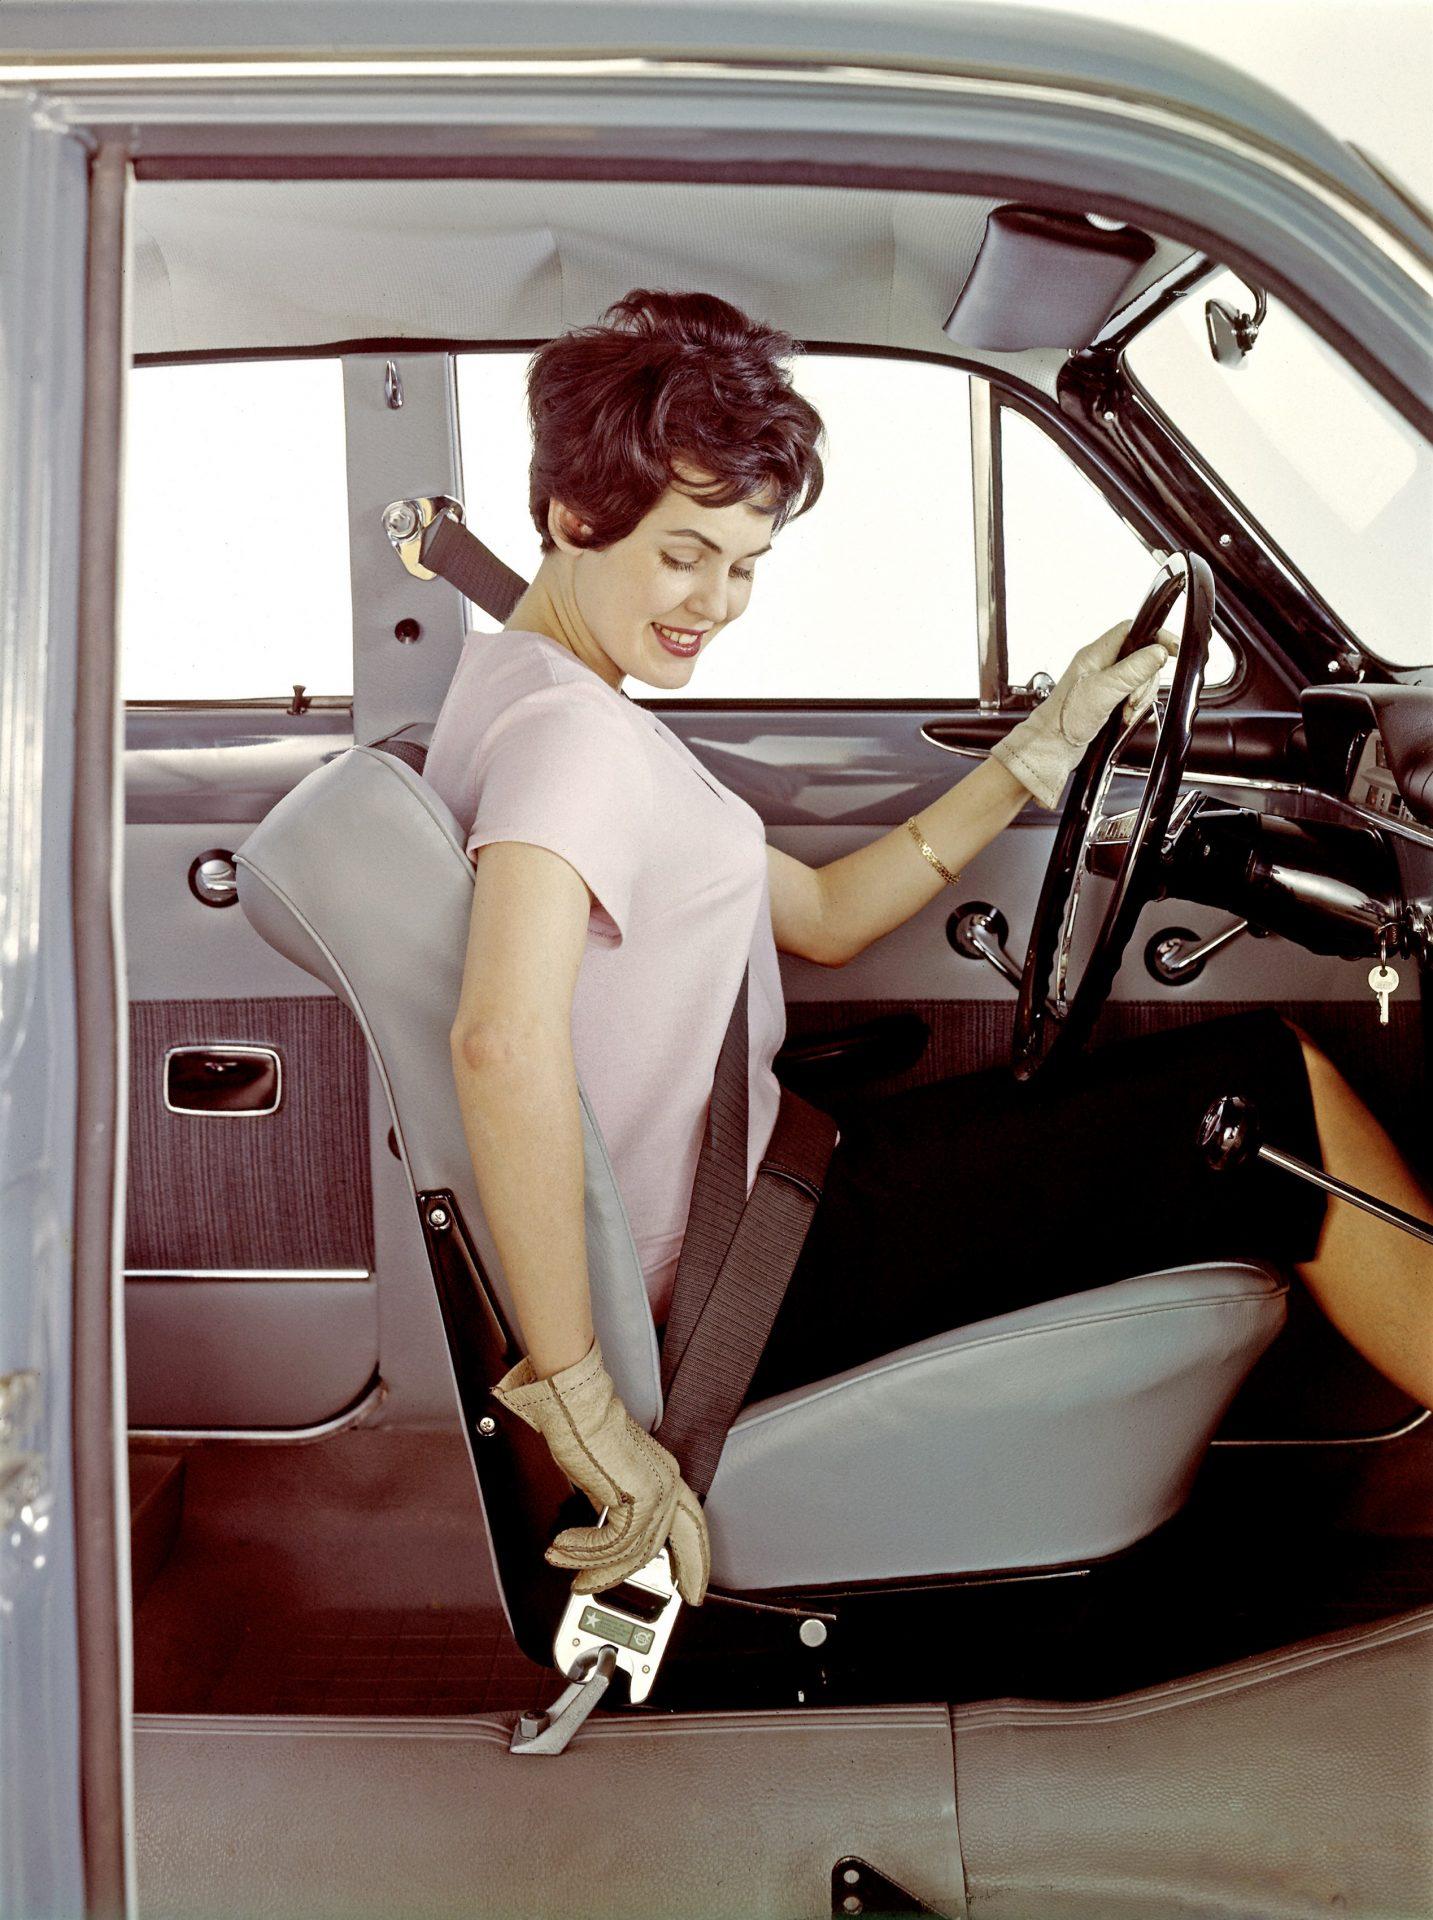 3 point front safety (seat) belt standard